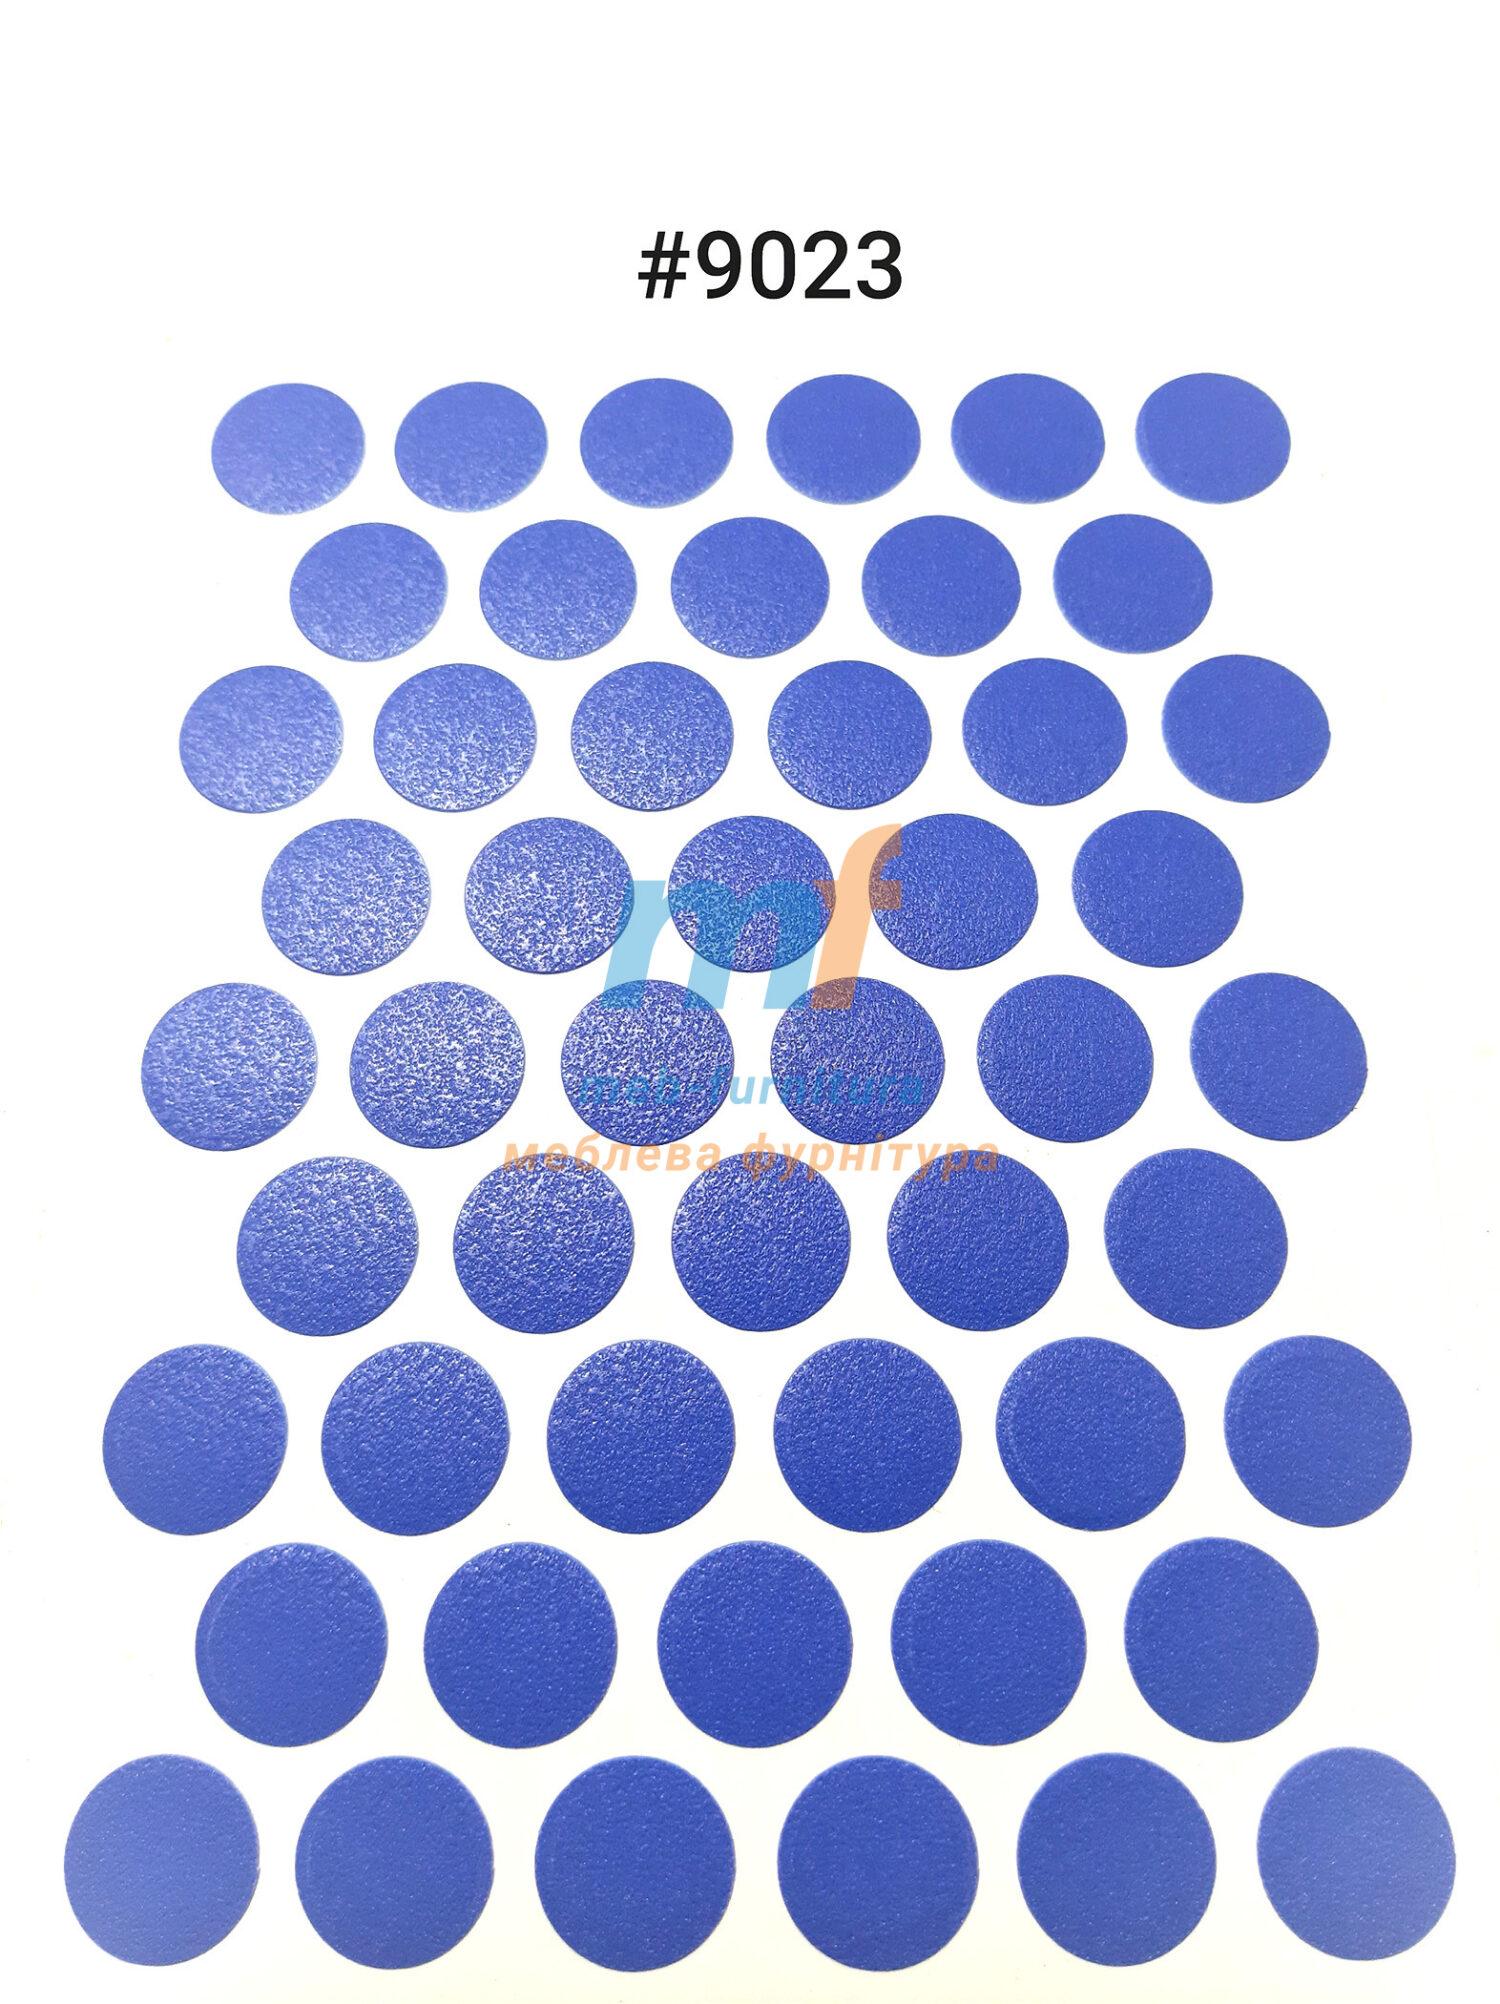 Заглушка на самоклейке для конфирмата,шурупа (9023)